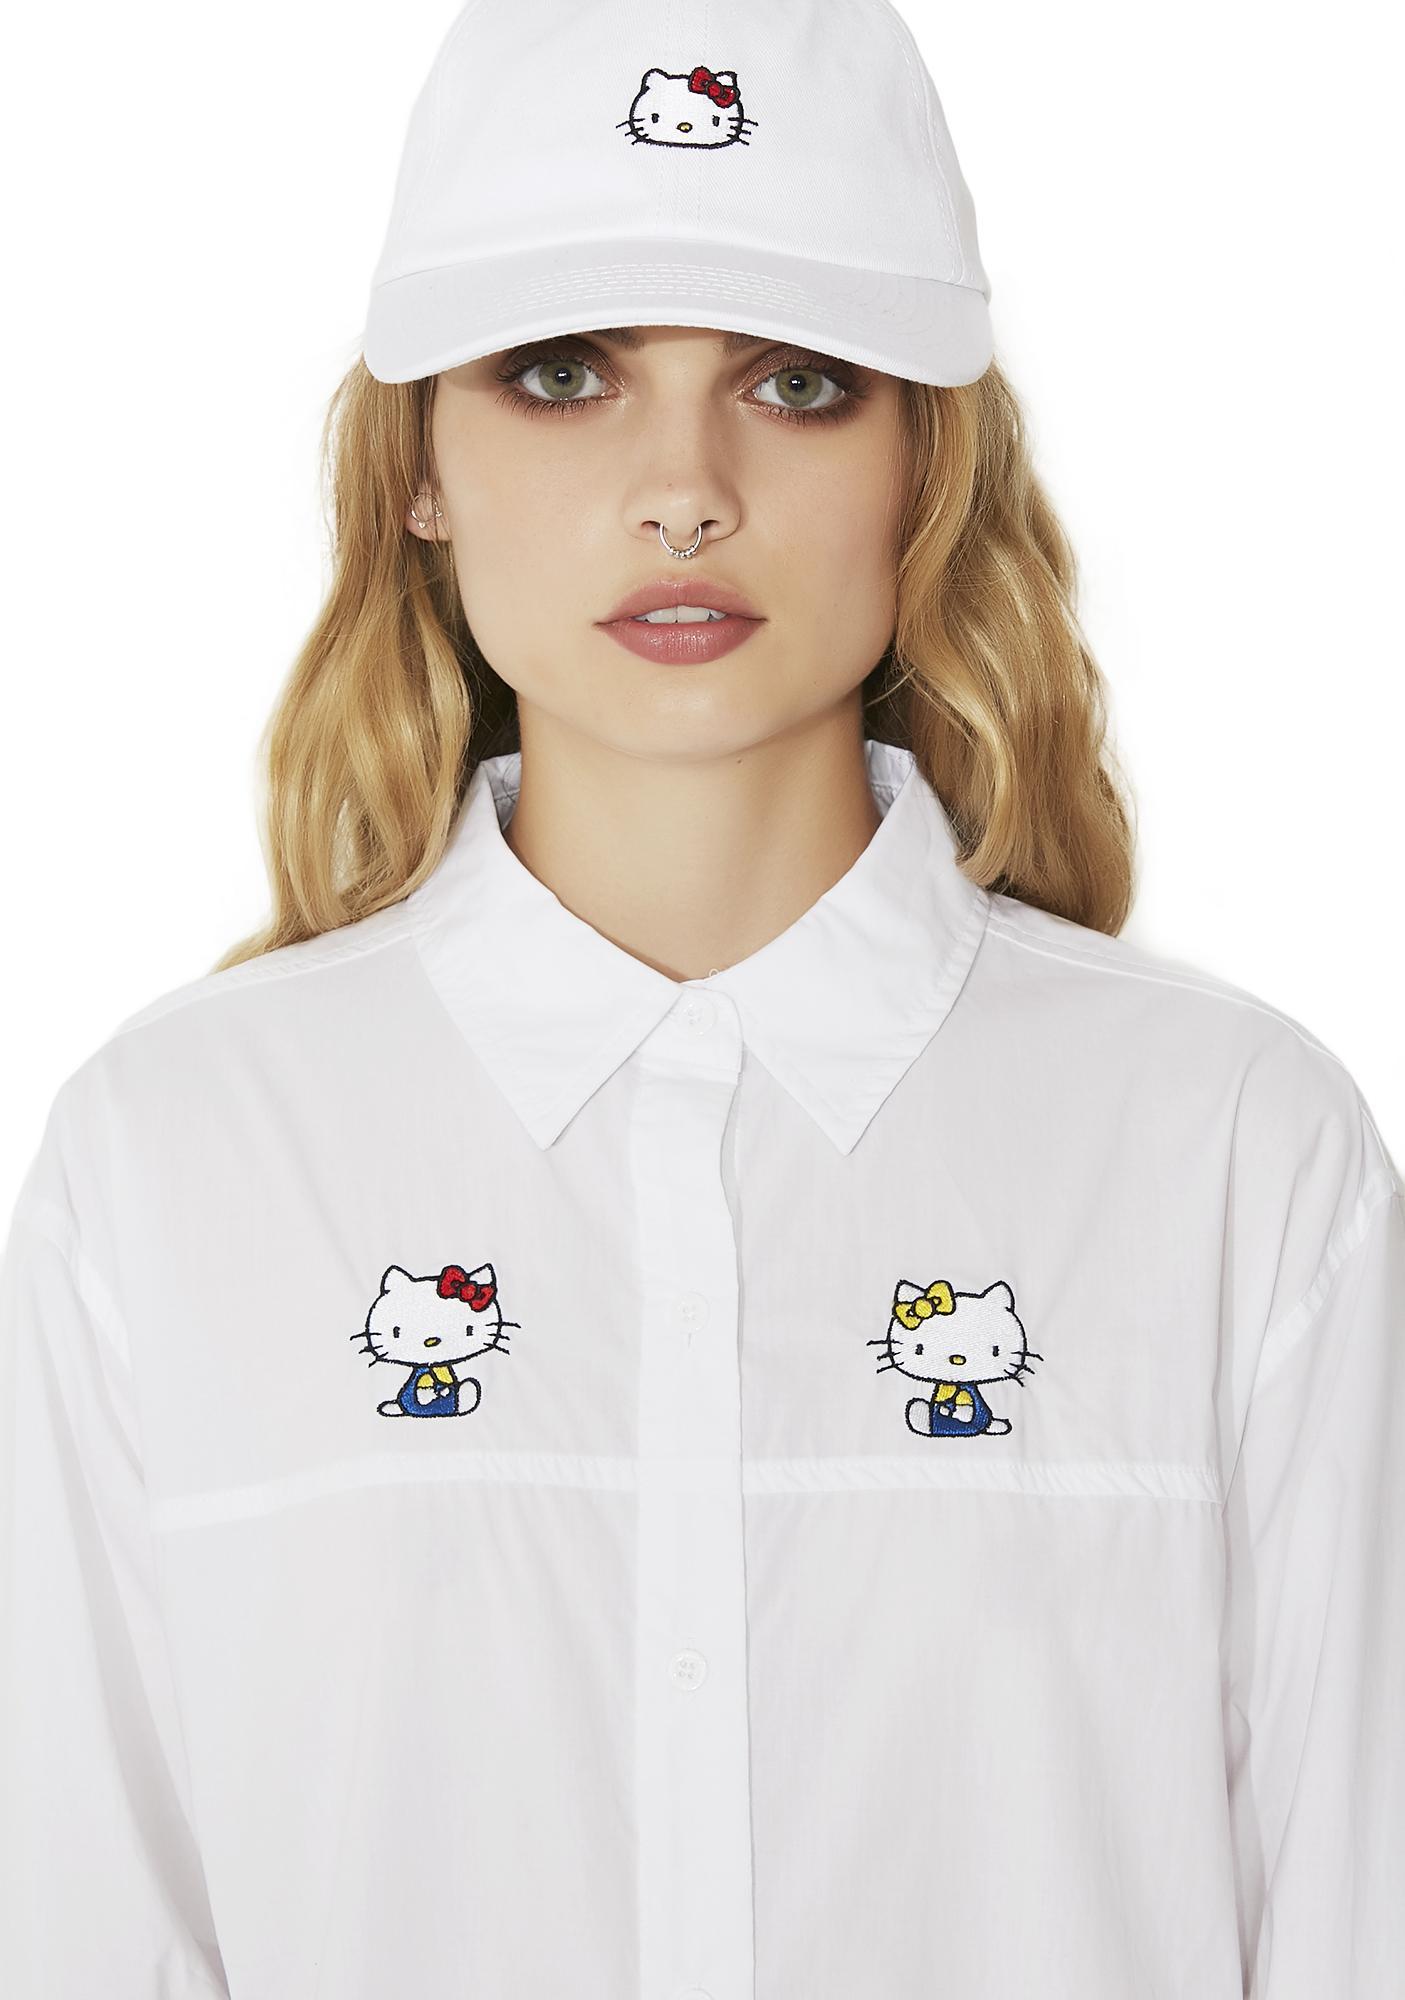 Lazy Oaf Hello Kitty Bow Tie Shirt